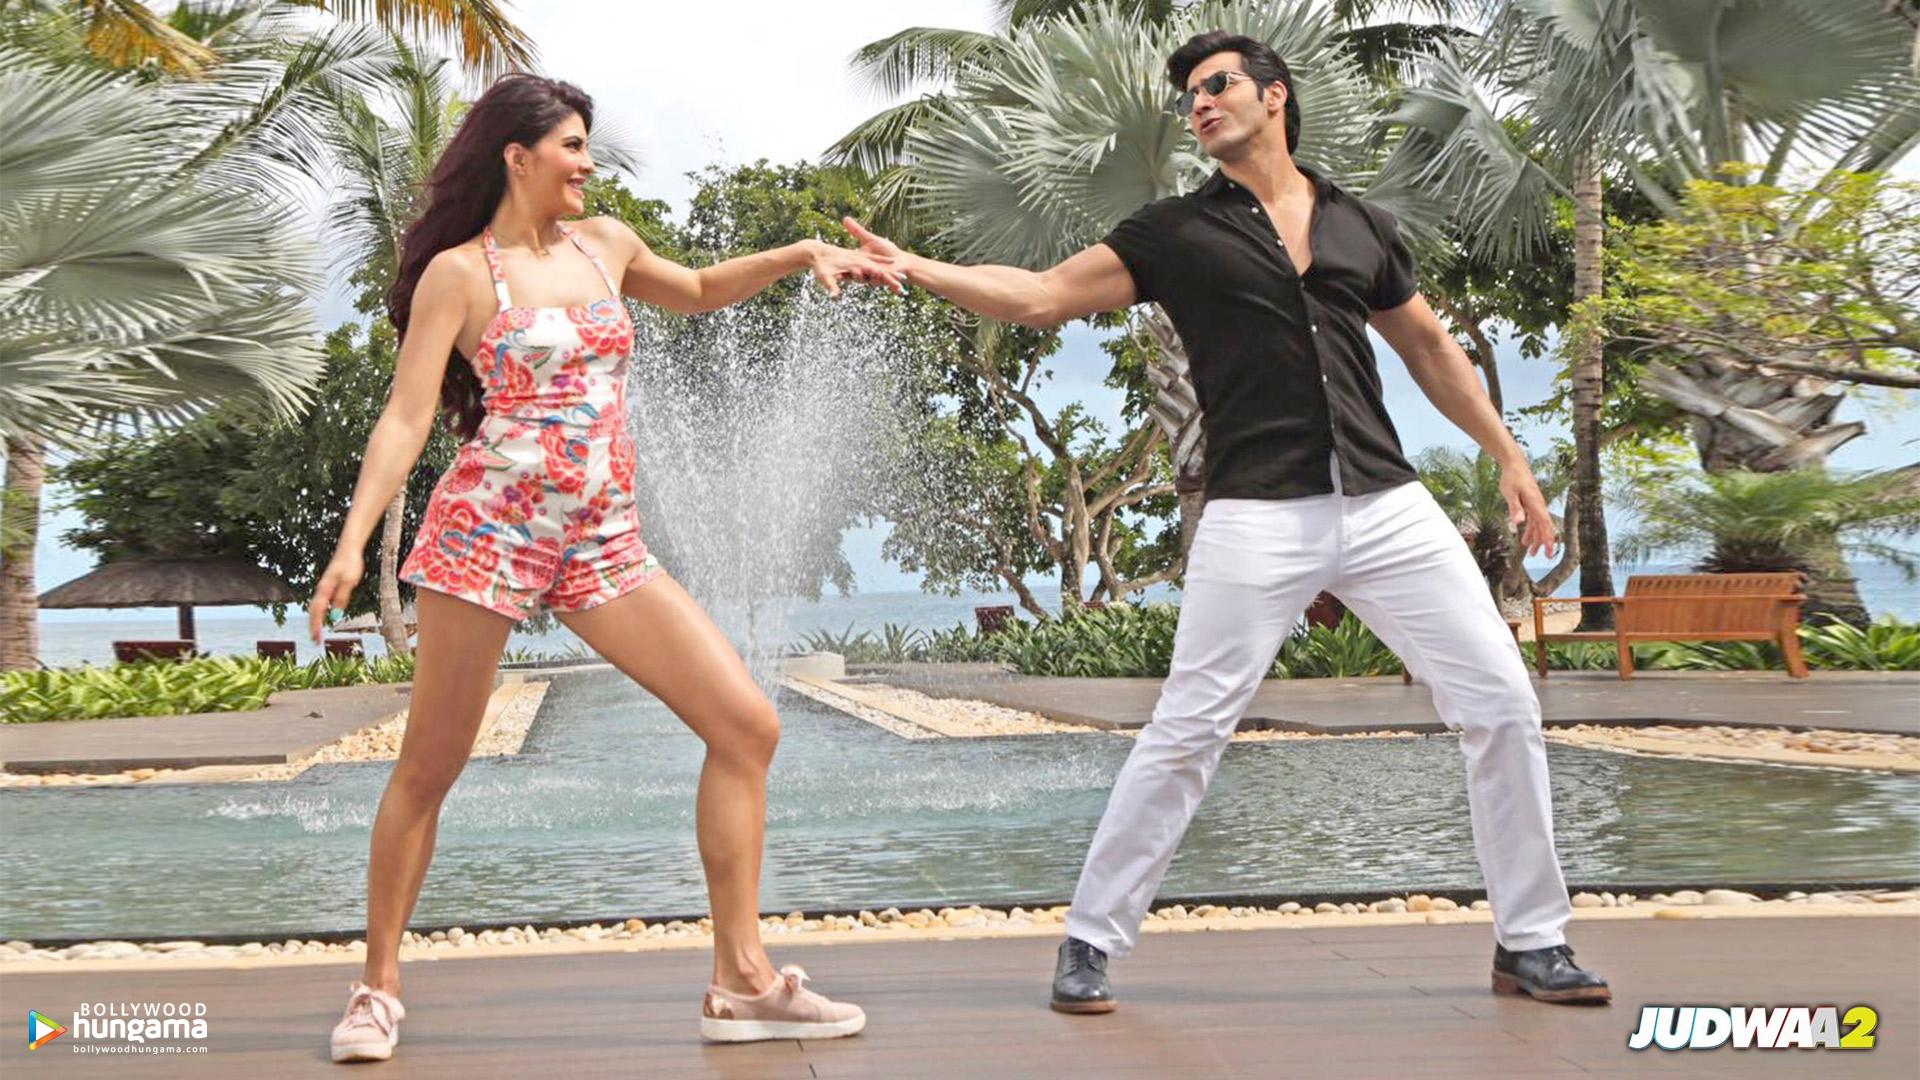 judwaa 2017 full hindi movie download